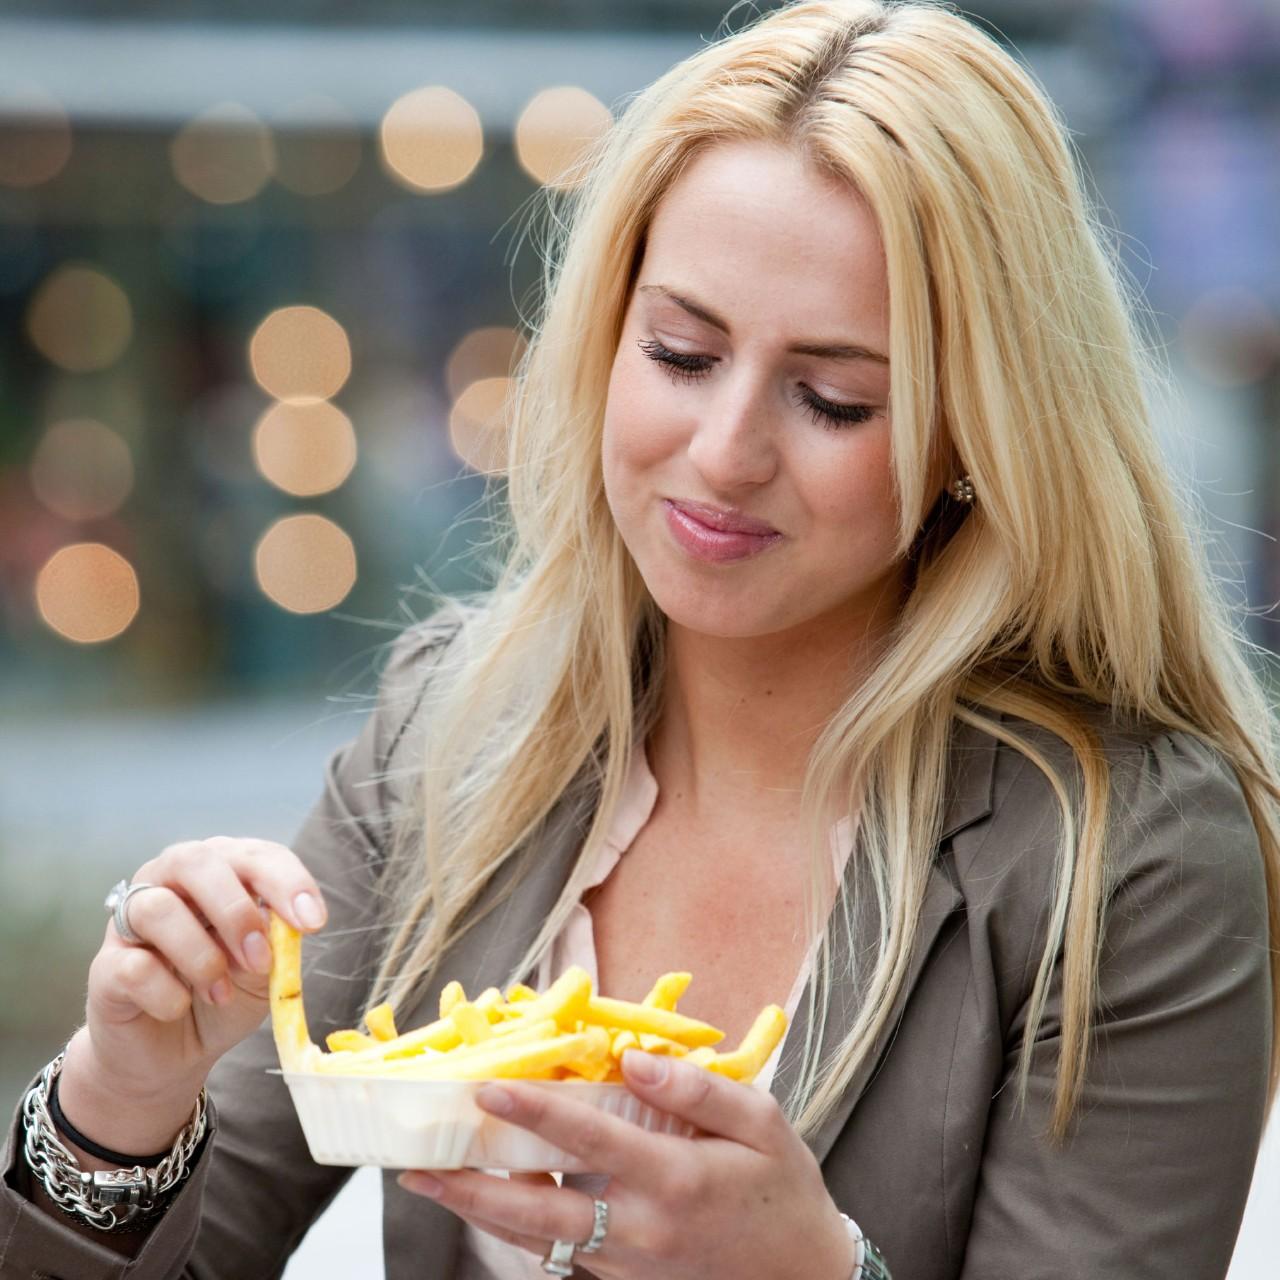 8. Comida frita